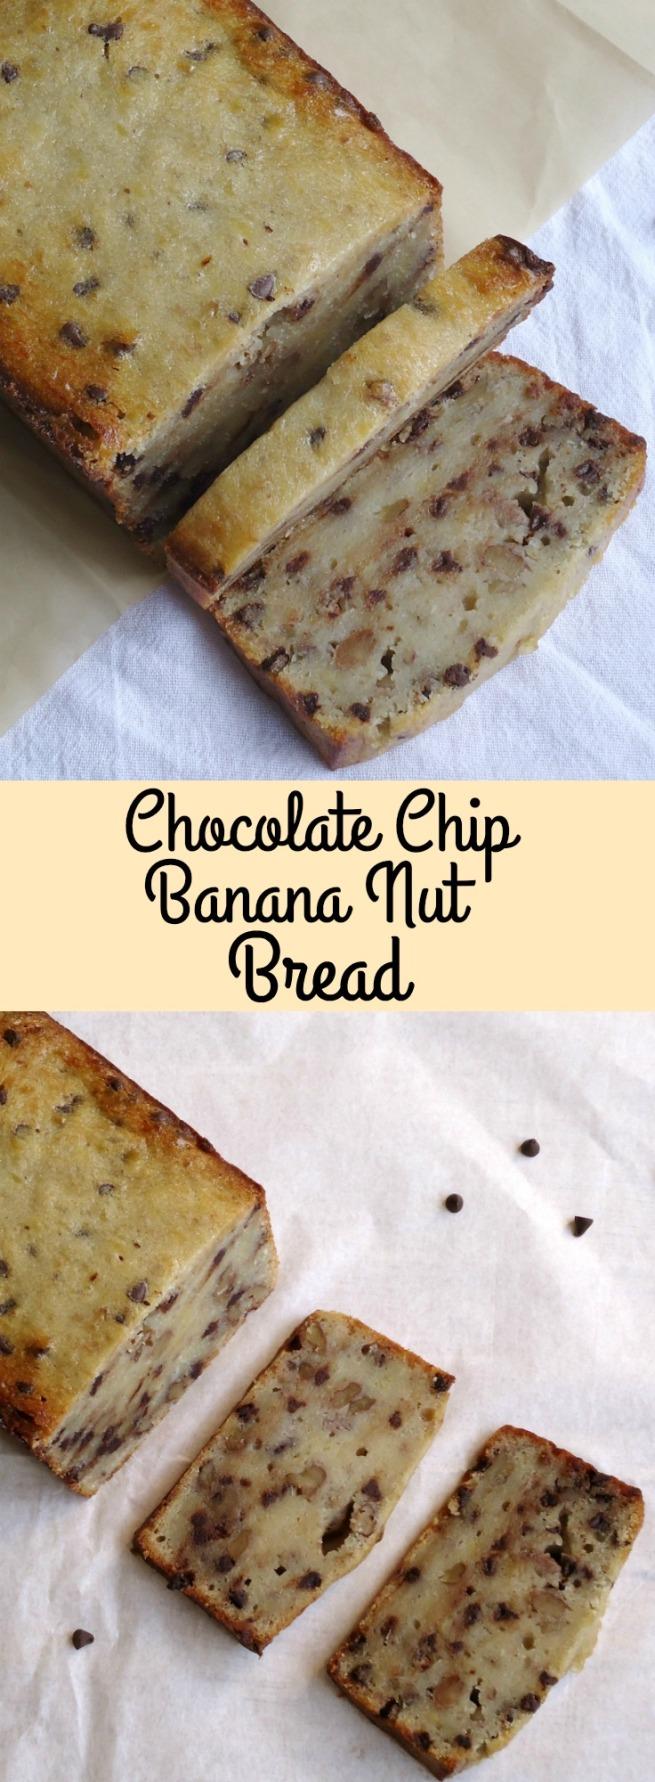 Chocolate Chip Banana Nut Bread Unwed Housewife